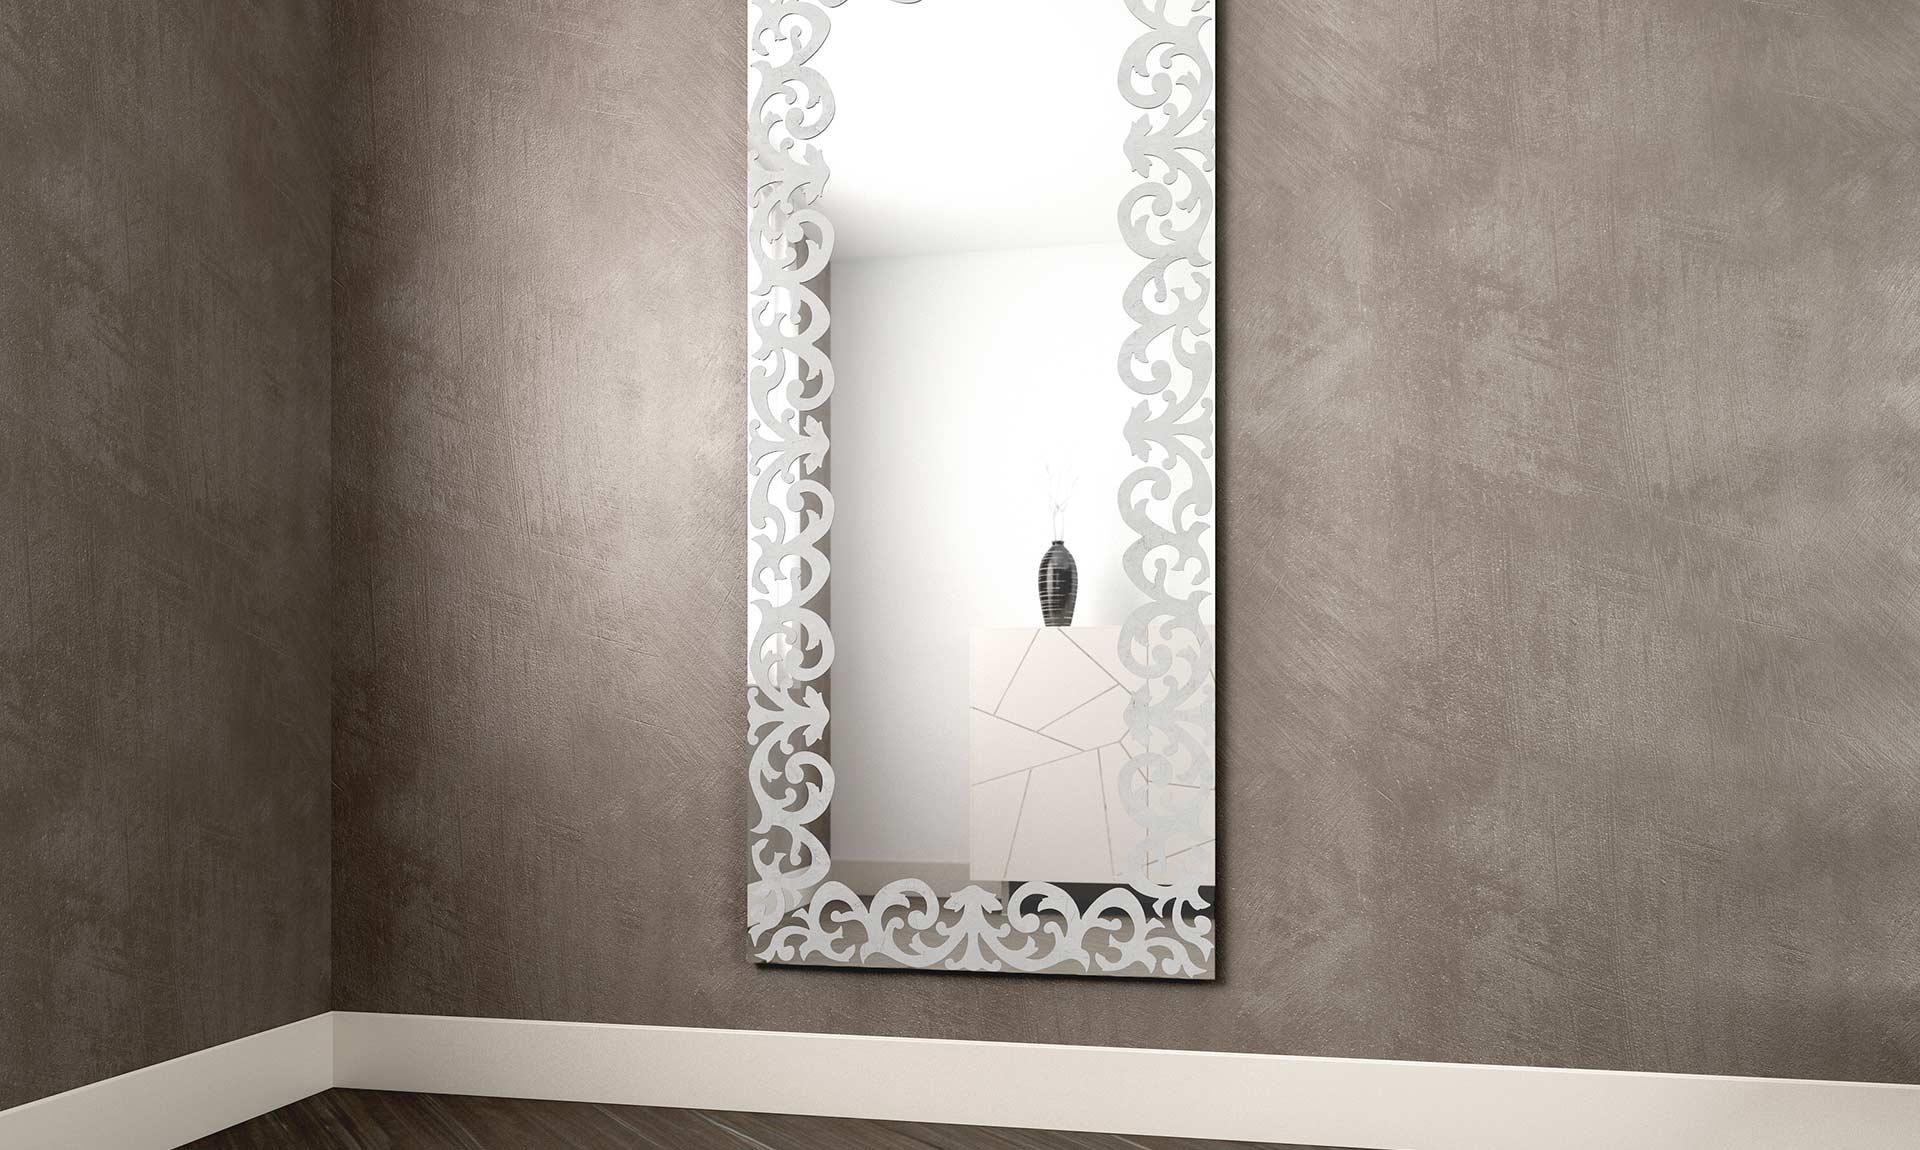 Specchi Da Muro Moderni.Specchi Moderni Specchio Per Bagno Dal Design Moderno N With